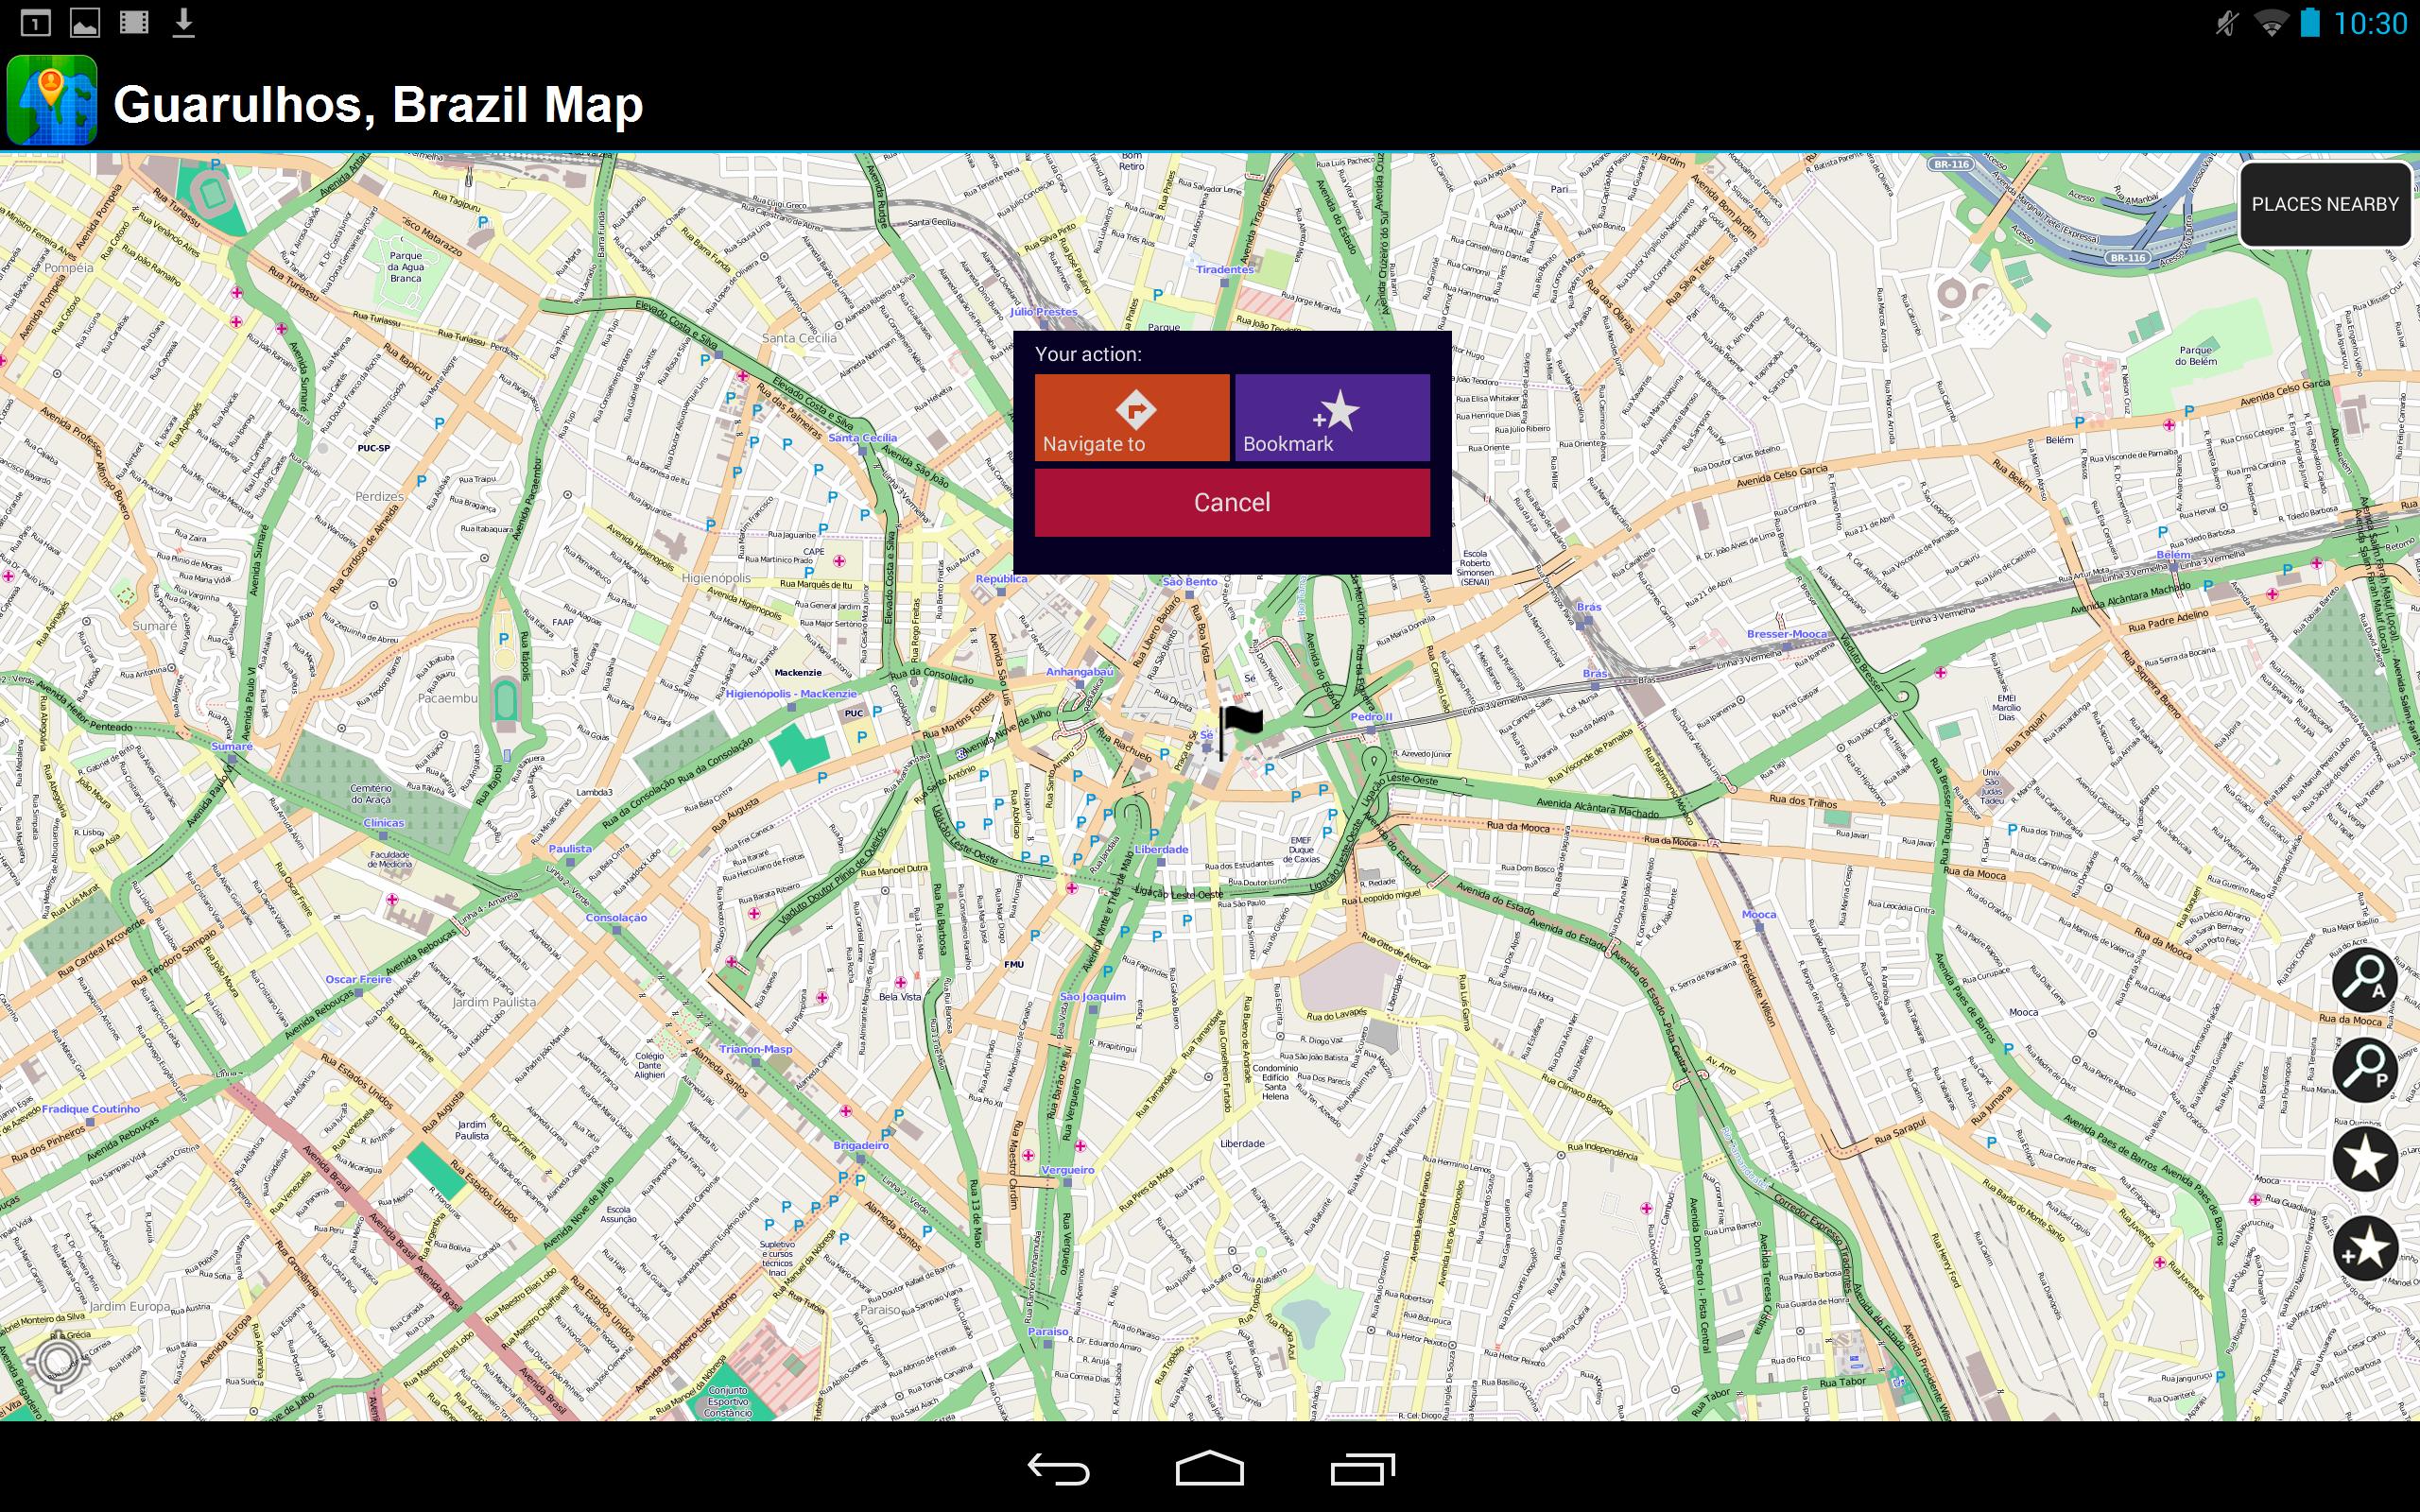 https://www.nextinpact.com/archive/69692-nokia-drive-hors-ligne-maps-transport.htm